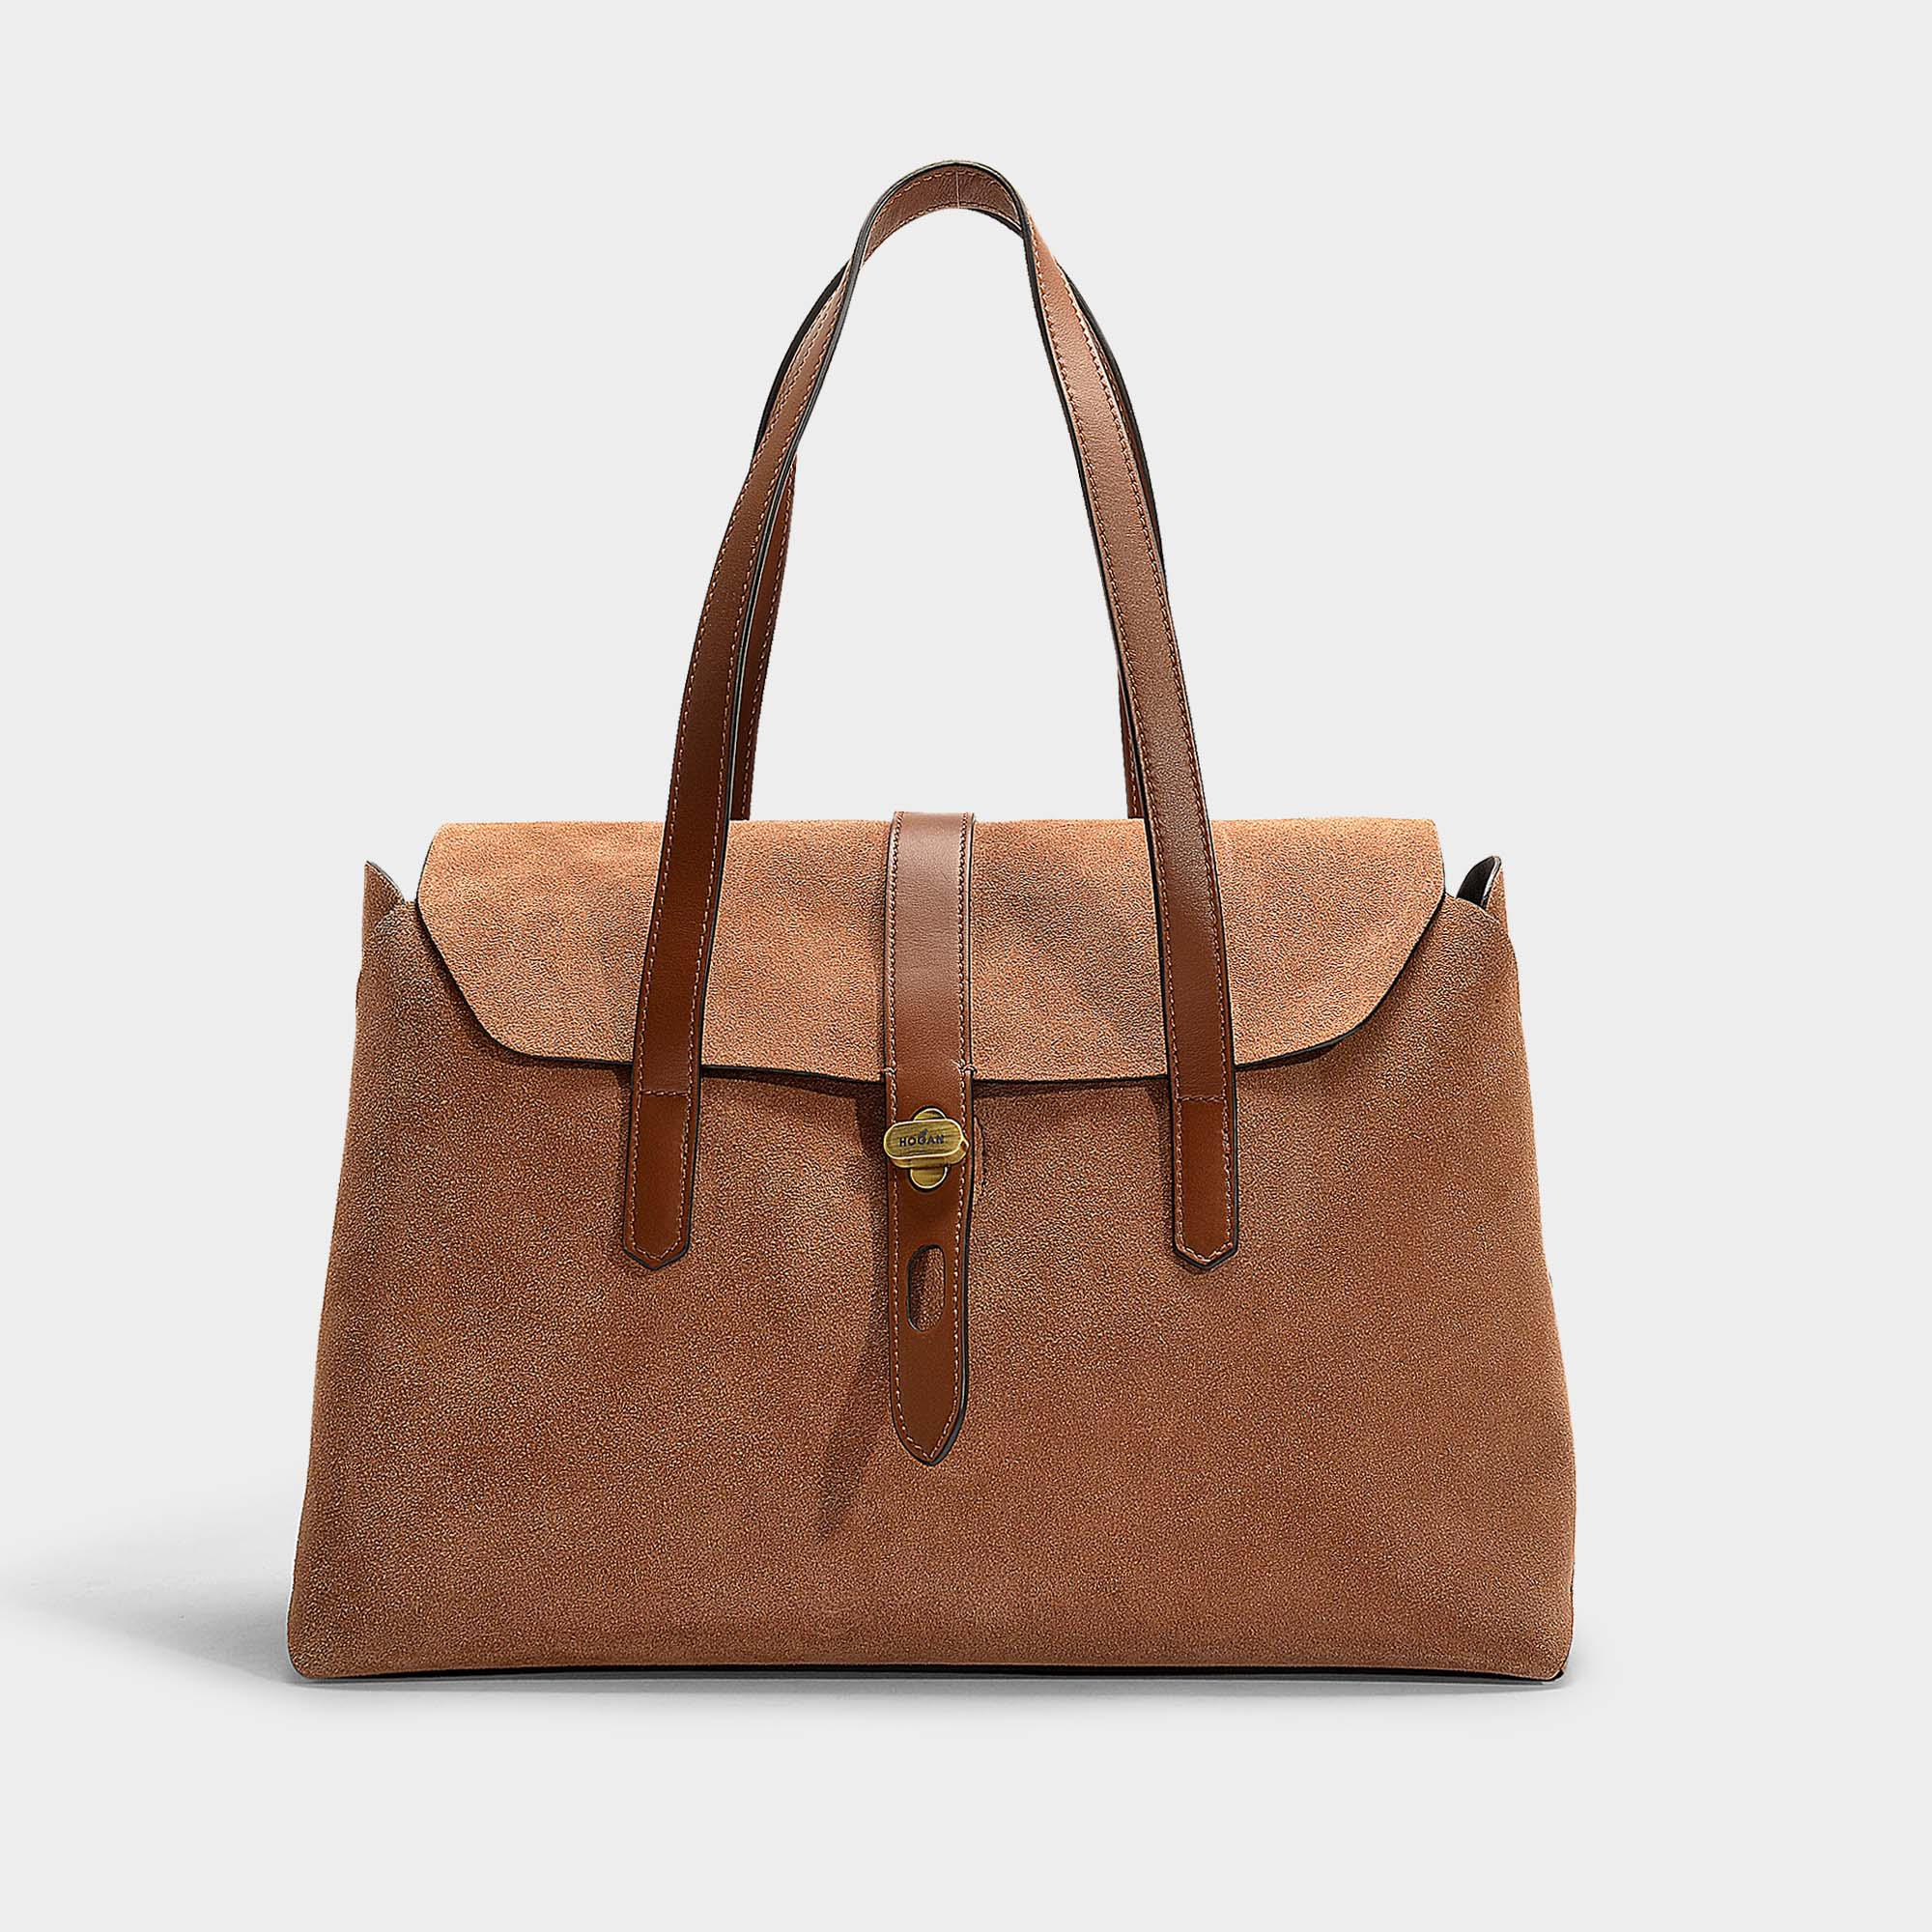 7ae5b30dd88 Hogan Shopping Goldigami Bag In Brown Calfskin in Brown - Lyst